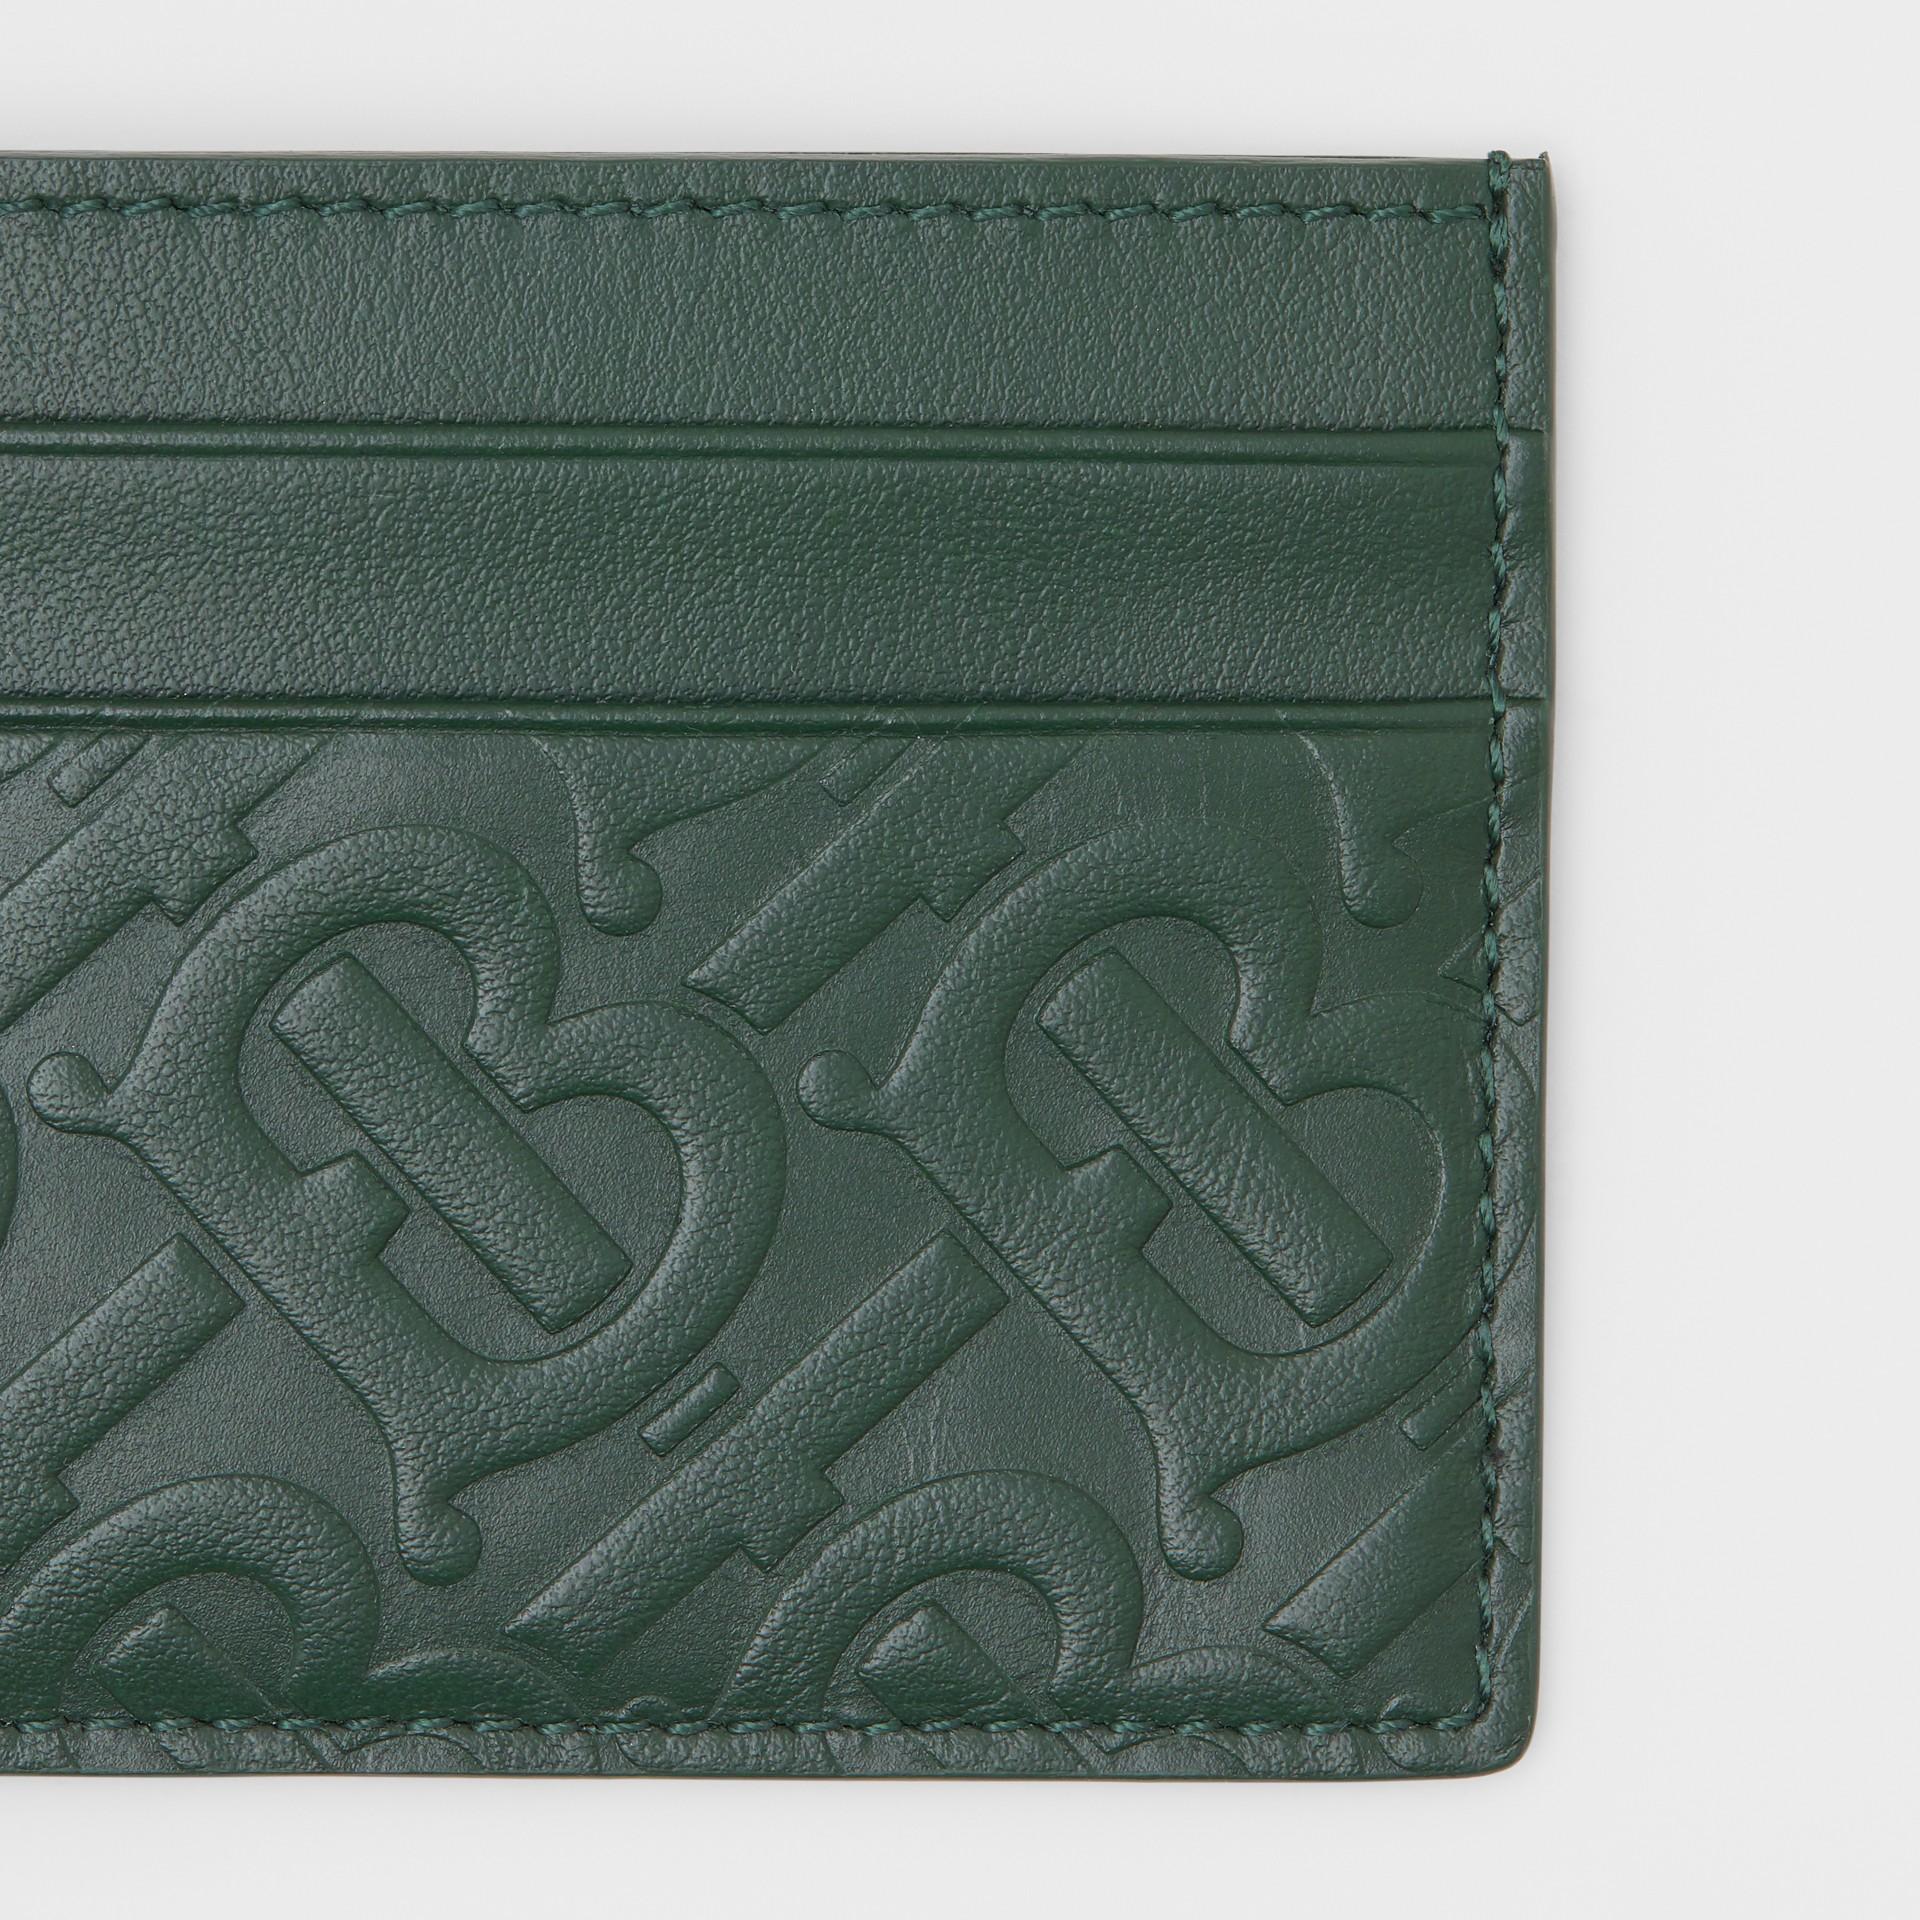 Monogram Leather Card Case in Dark Pine Green - Men   Burberry United Kingdom - gallery image 1